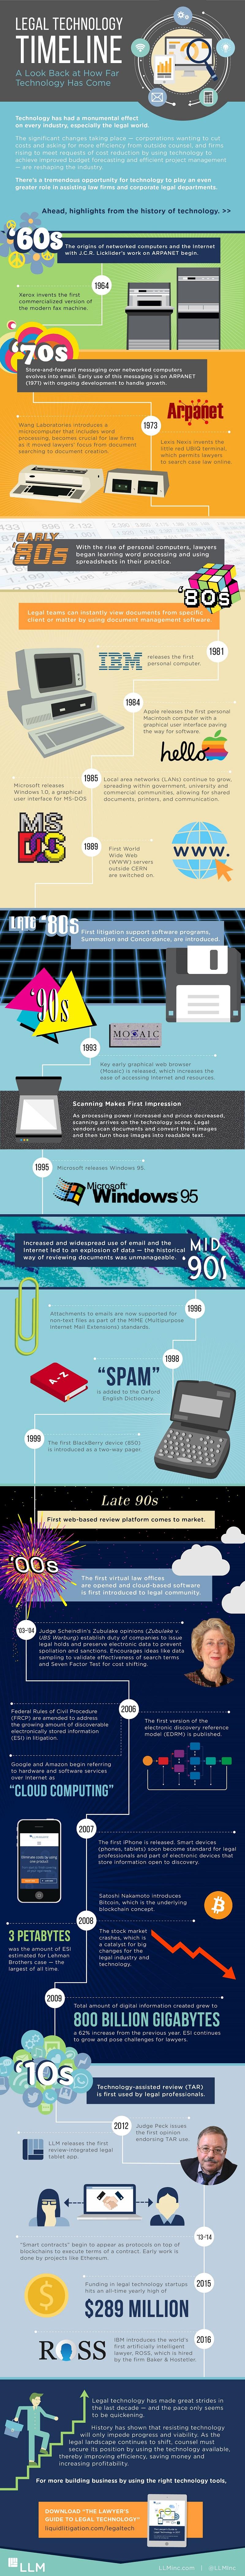 Legal Technology Timeline